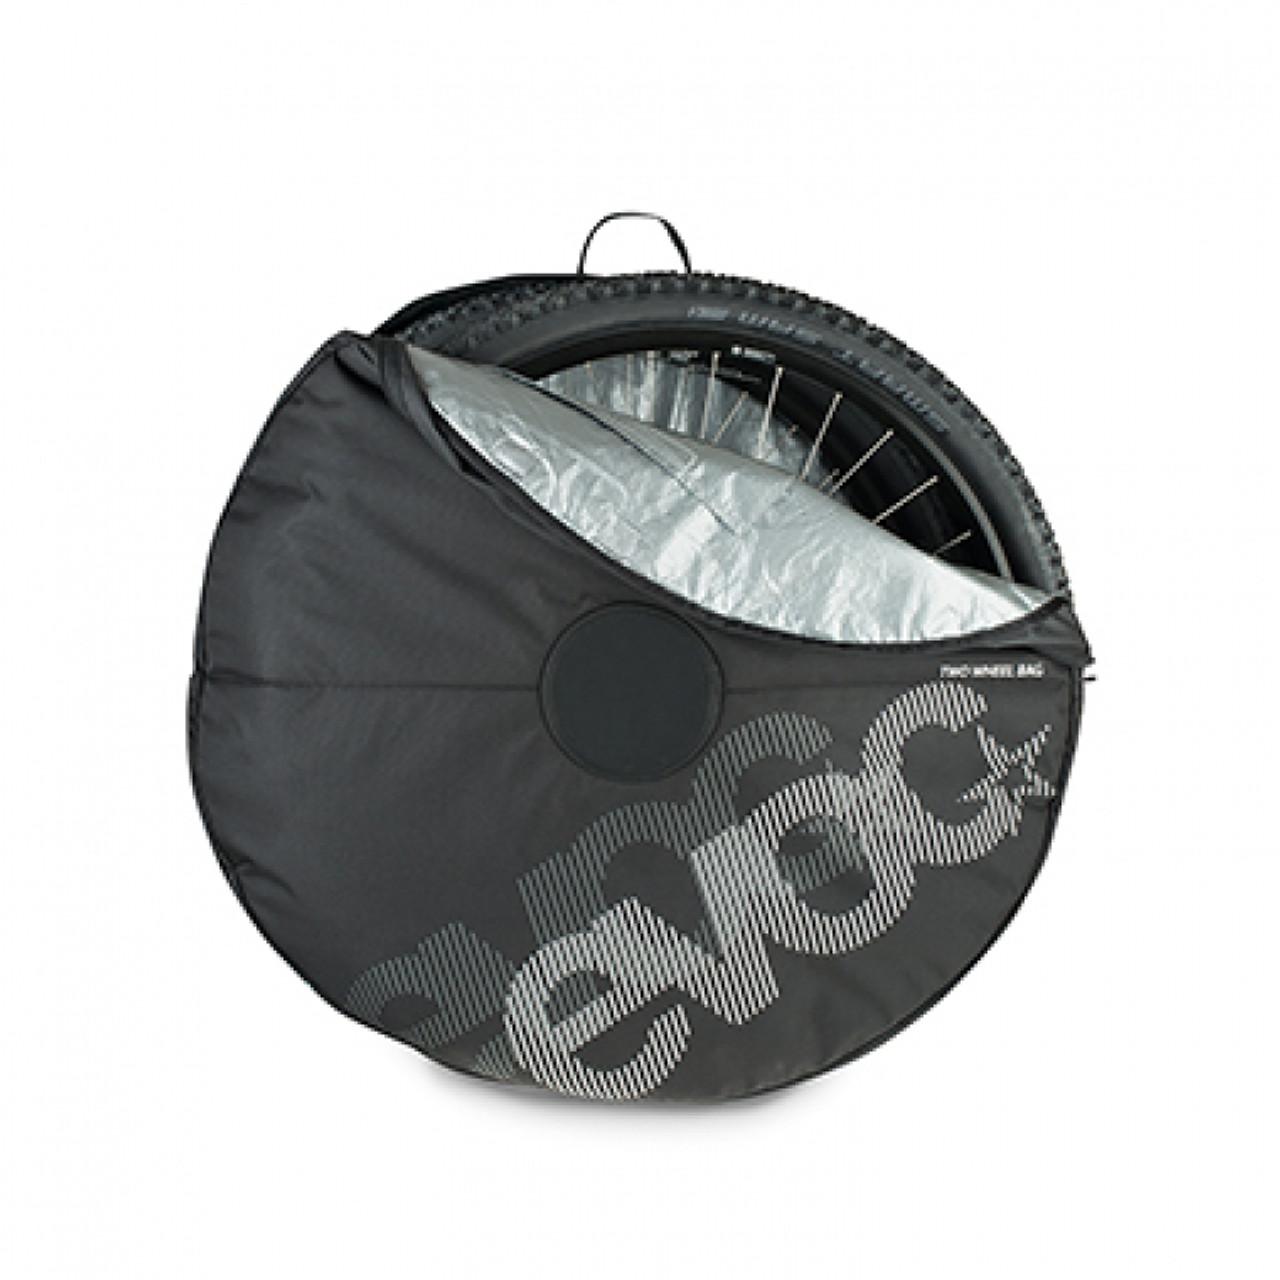 wheel bag for 2 bike wheels